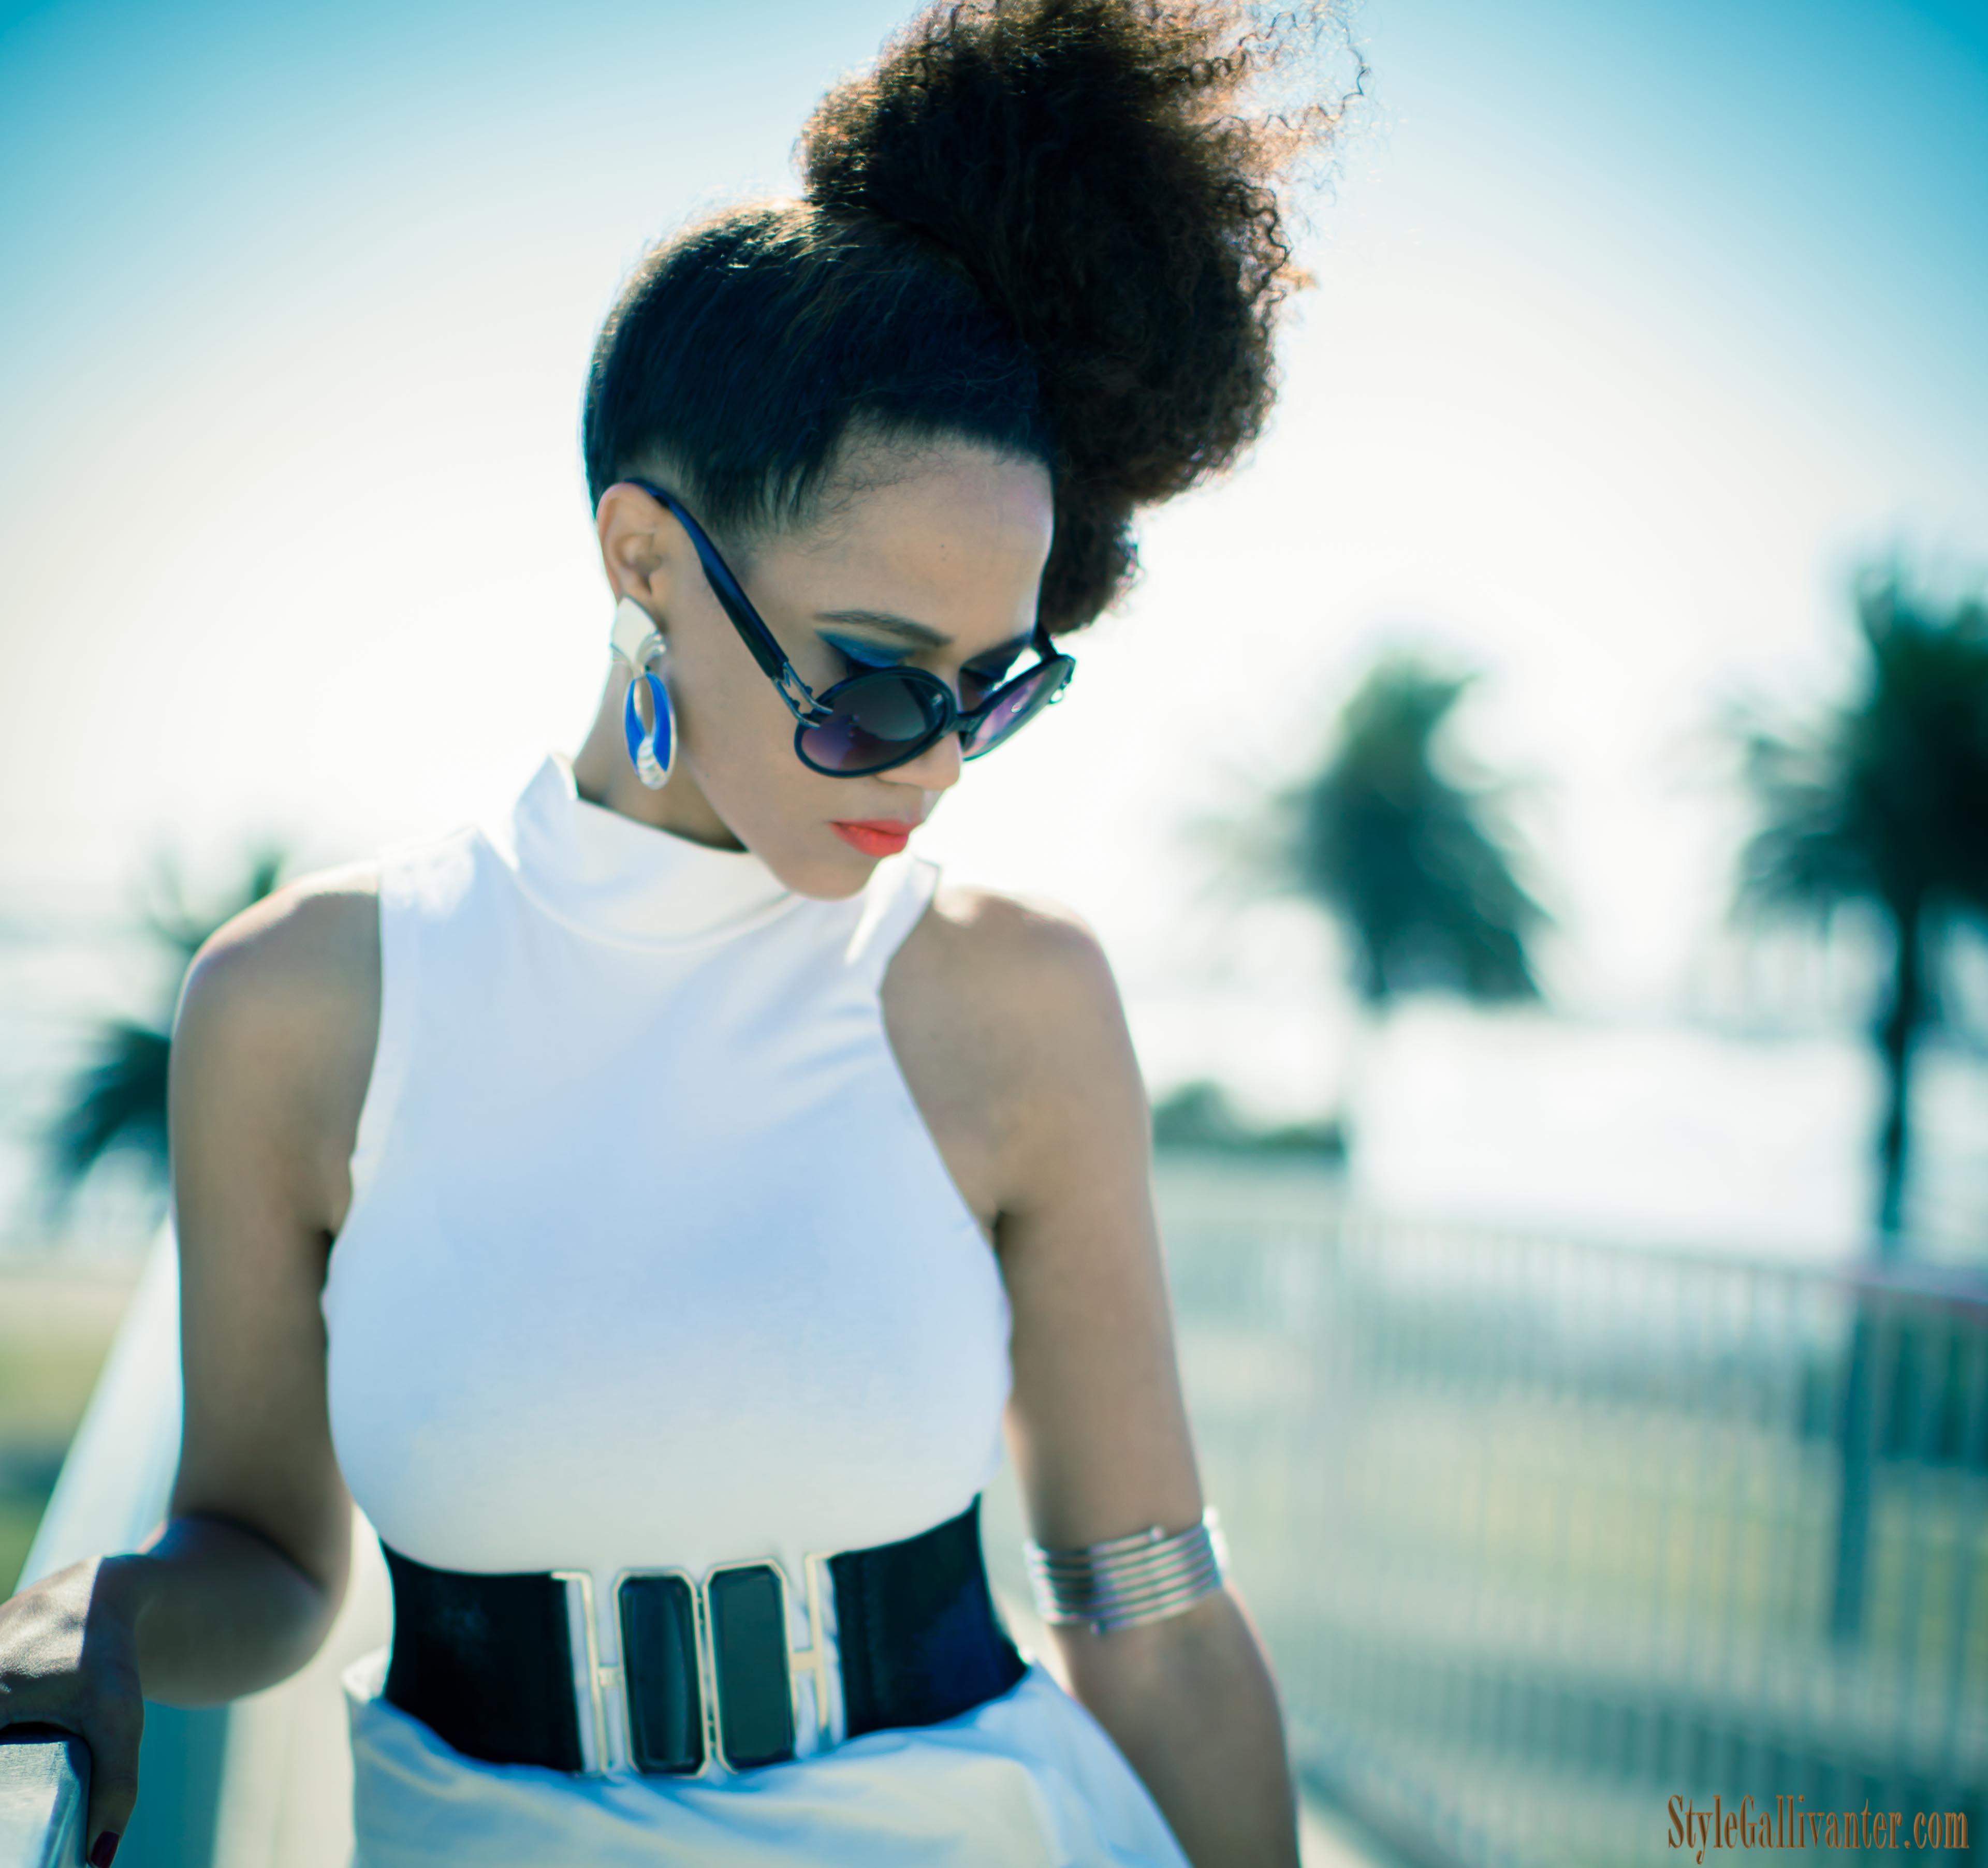 MIRANDA-SAKHINO-2015_STYLEGALLIVANTER.COM_STYLEGALLAVANTER_AFRICAN-FASHION-BLOGGERS_mommy-bloggers-australia_top-mum-blogs-melbourne_stylish-mum-bloggers-australia-11